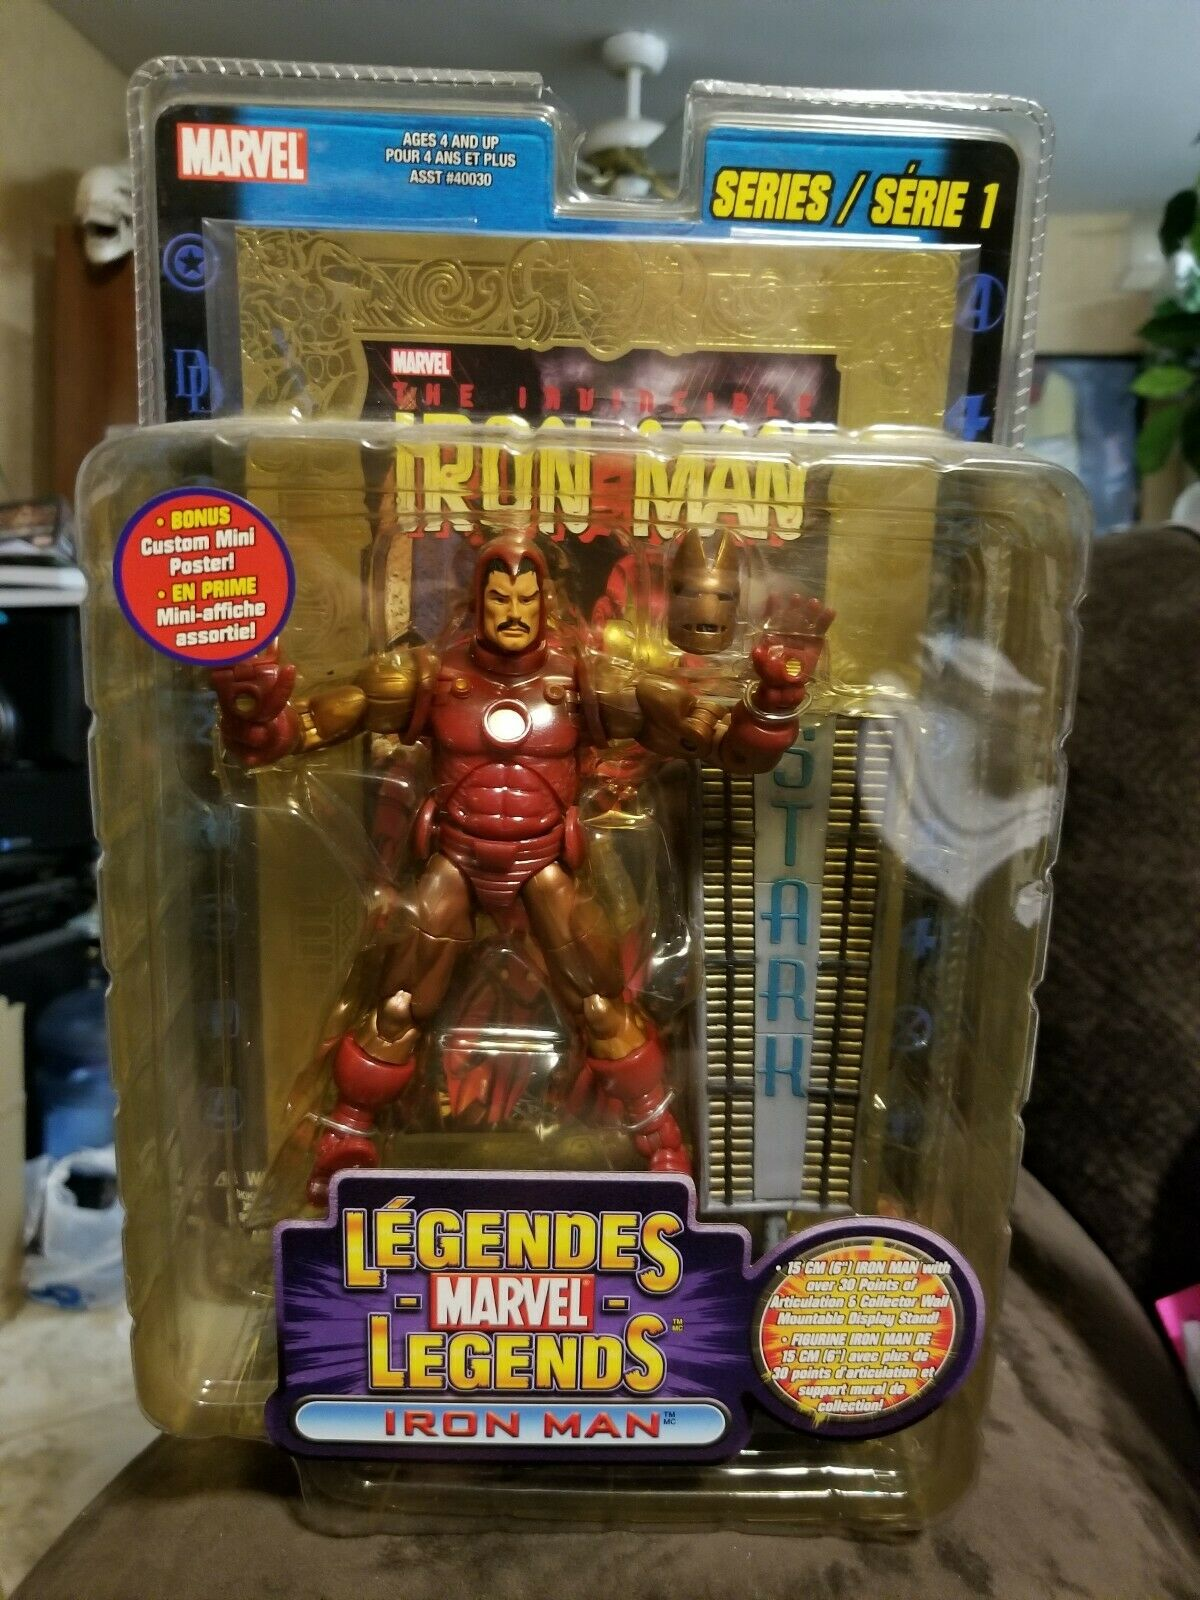 Marvel Legends Series 1 gold Foil Iron Man  (RARE FRENCH VERSION) Figure..